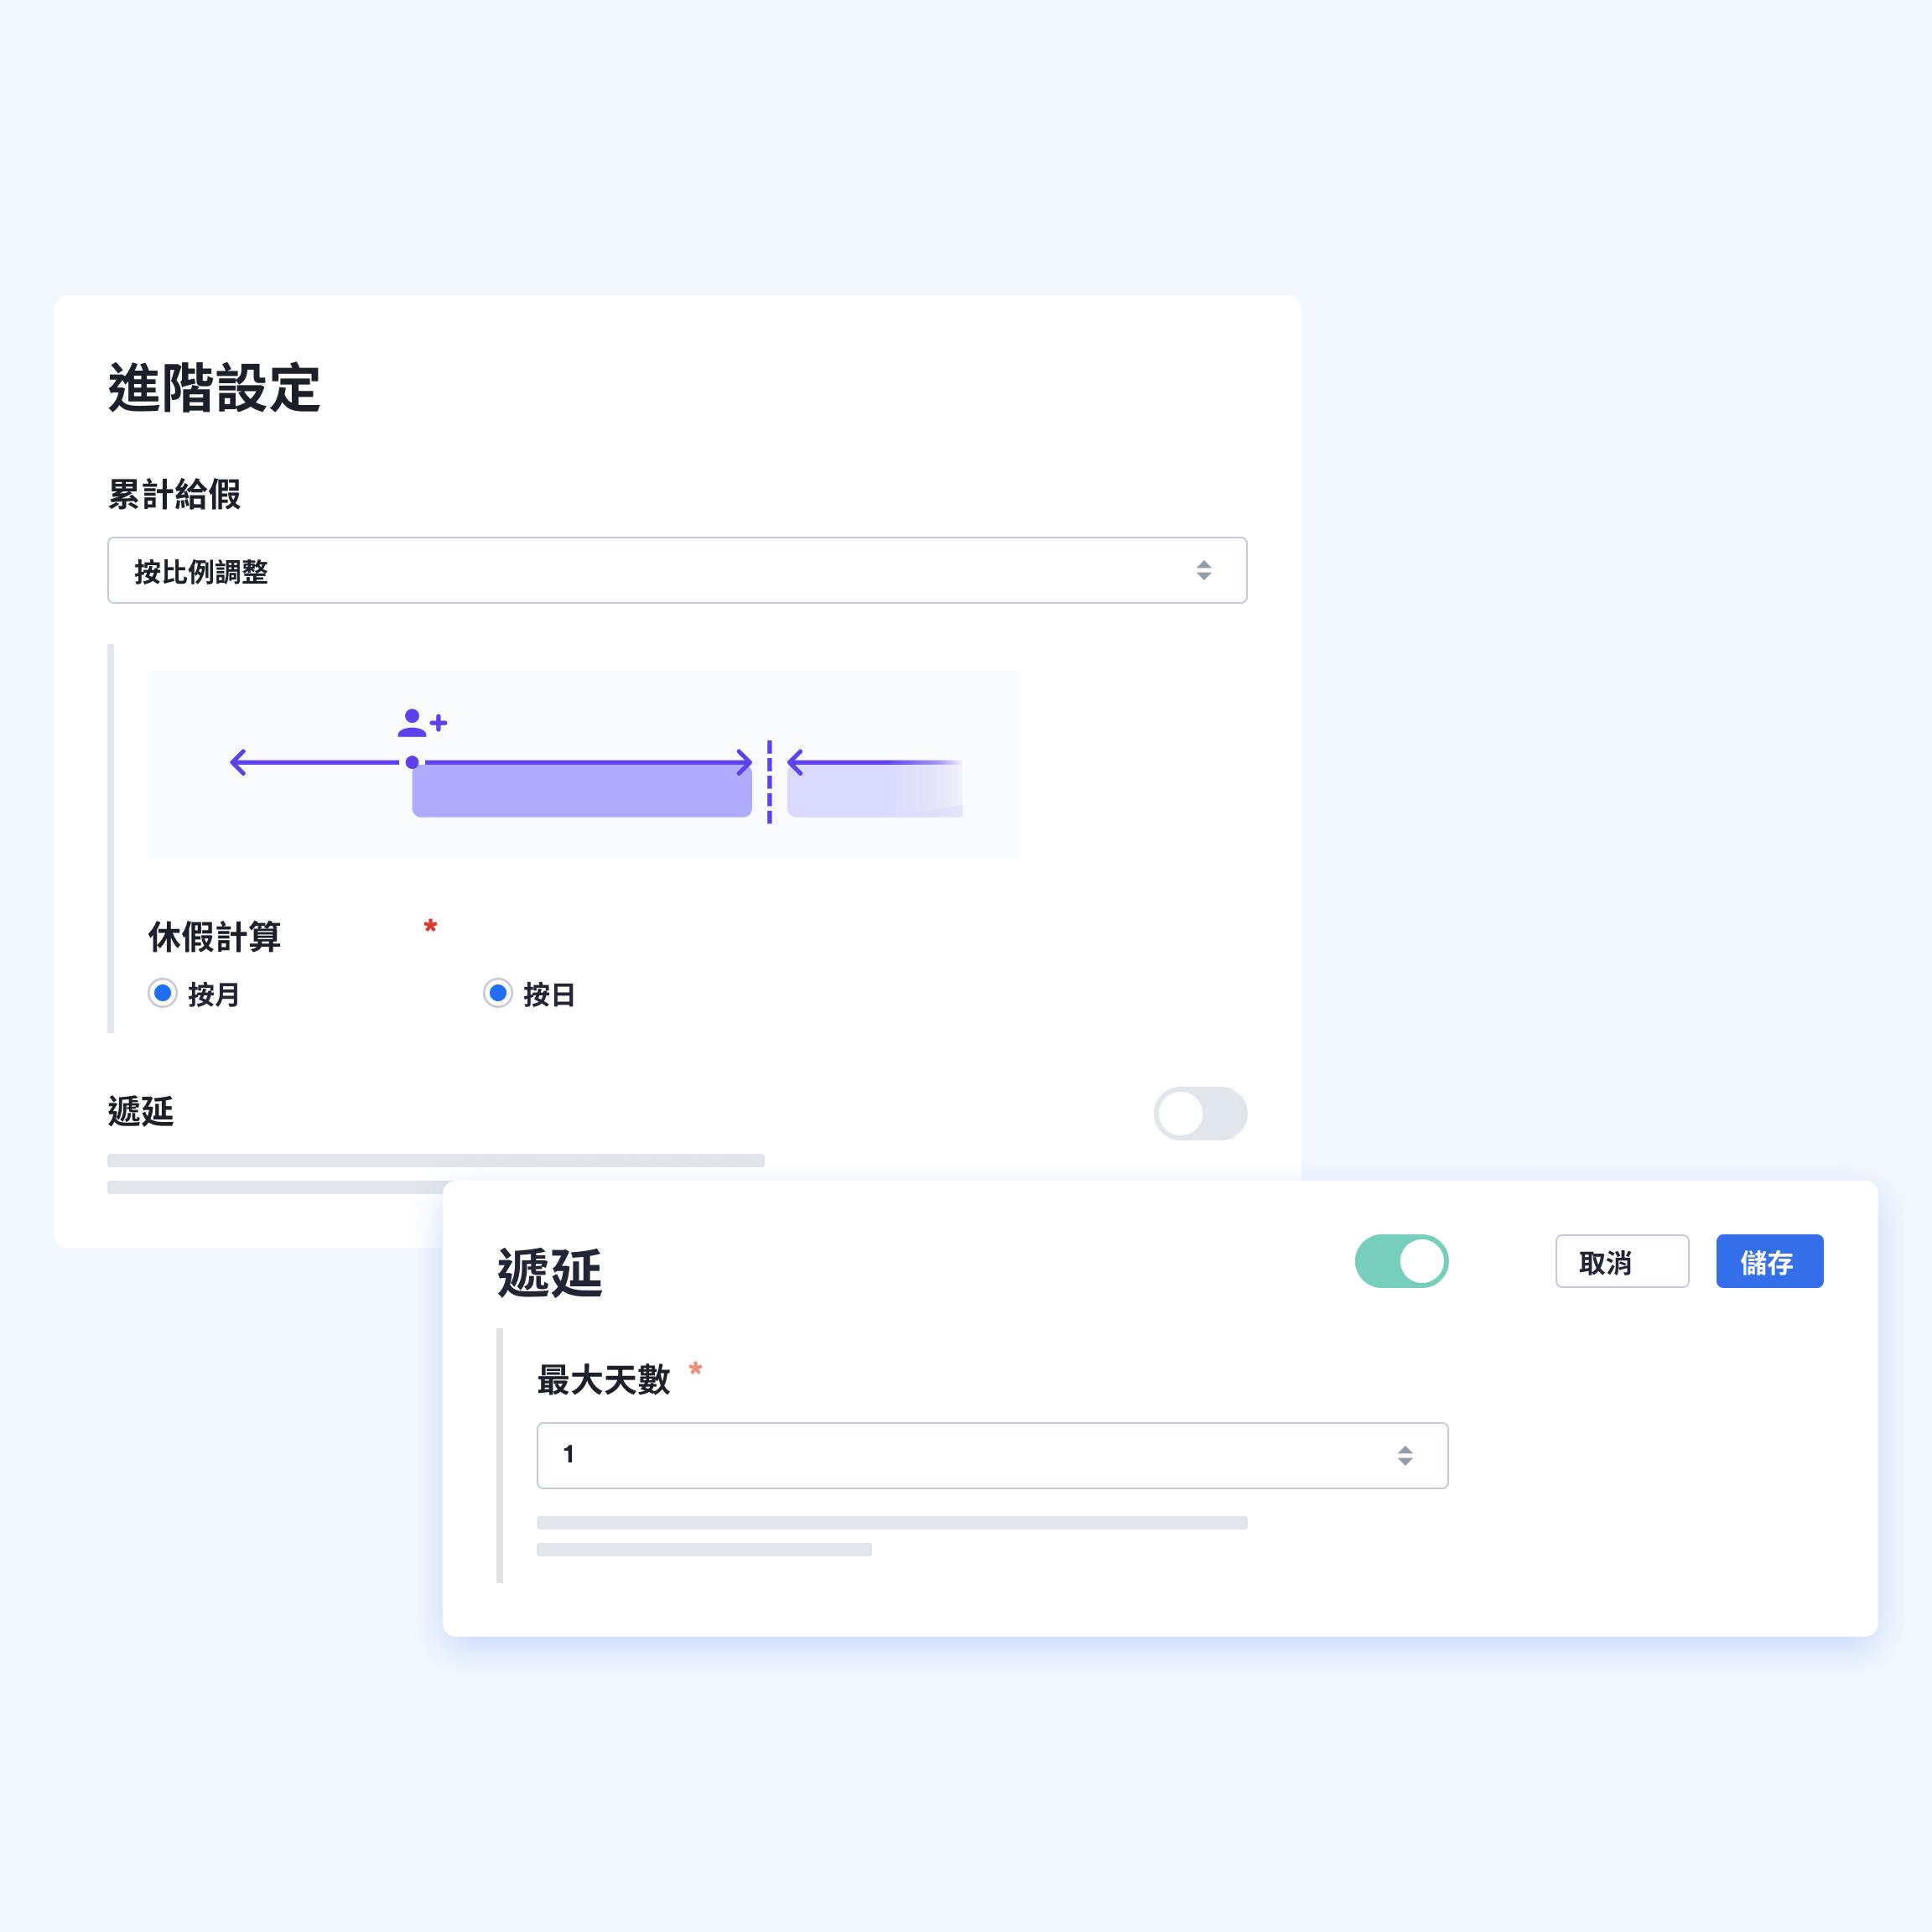 Swingvy雲端人資系統能自動更新休假餘額,更符合台灣勞基法一切規範。